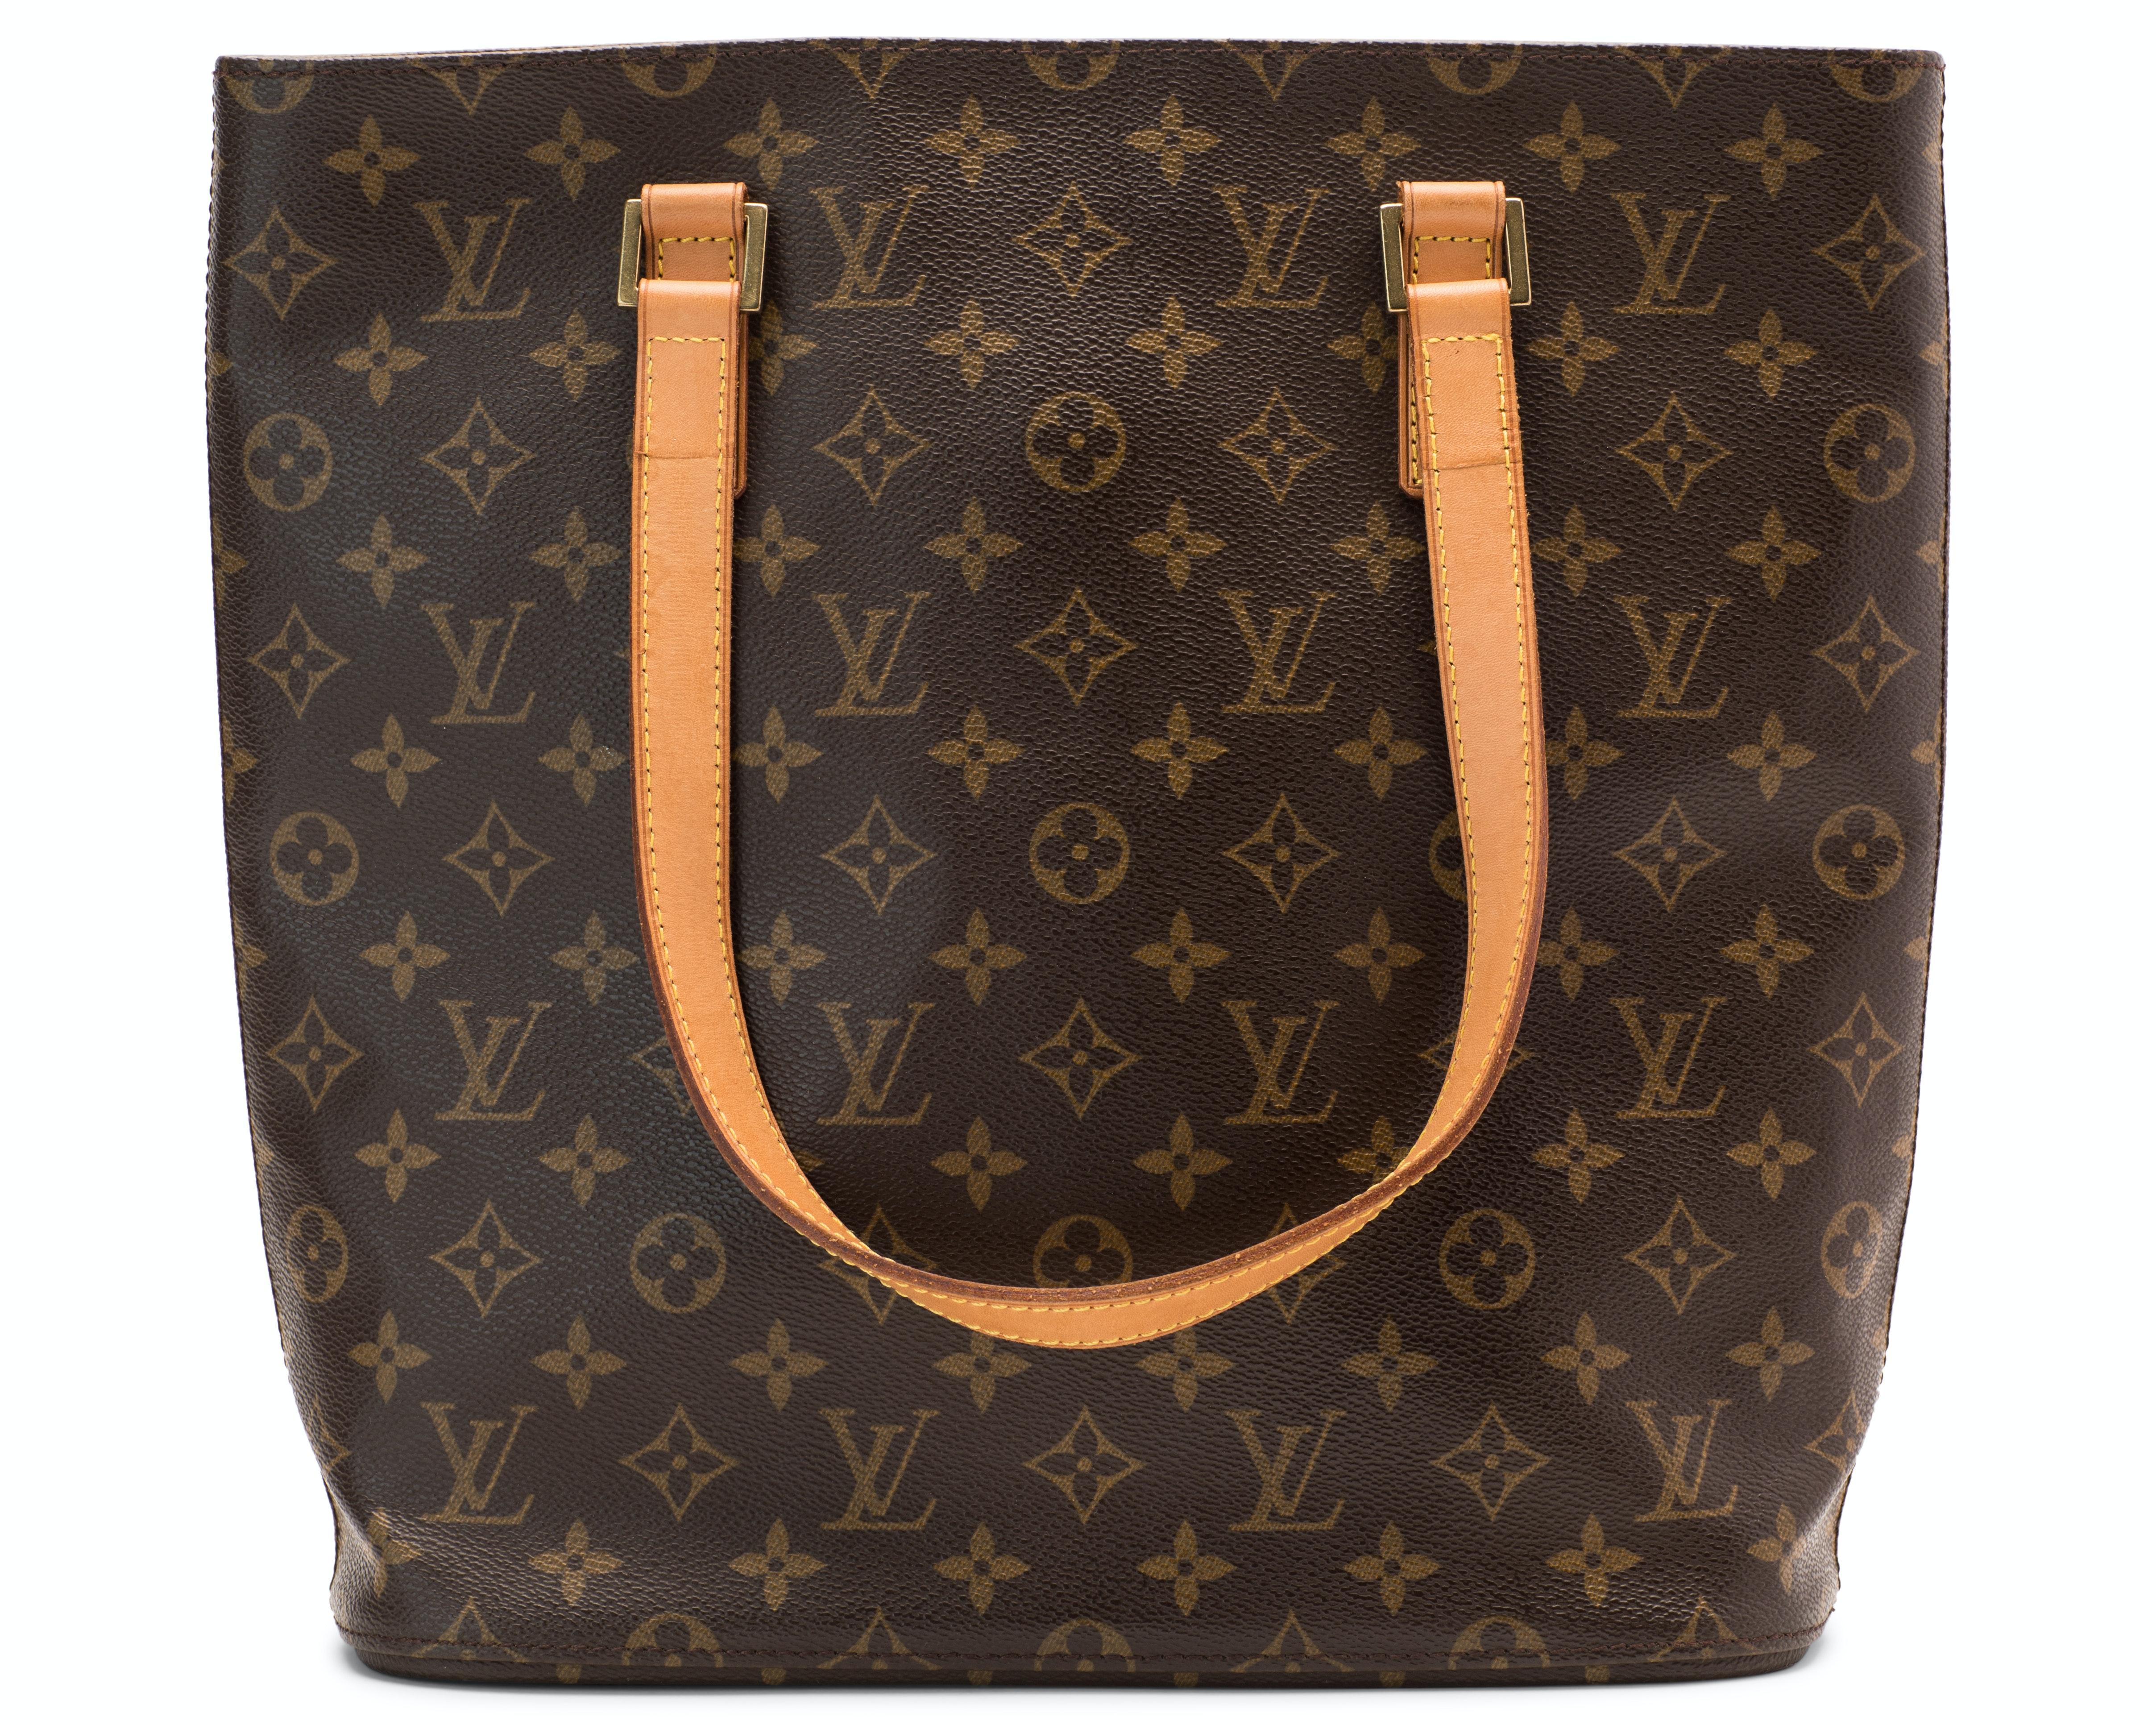 Louis Vuitton Vavin Monogram GM Brown